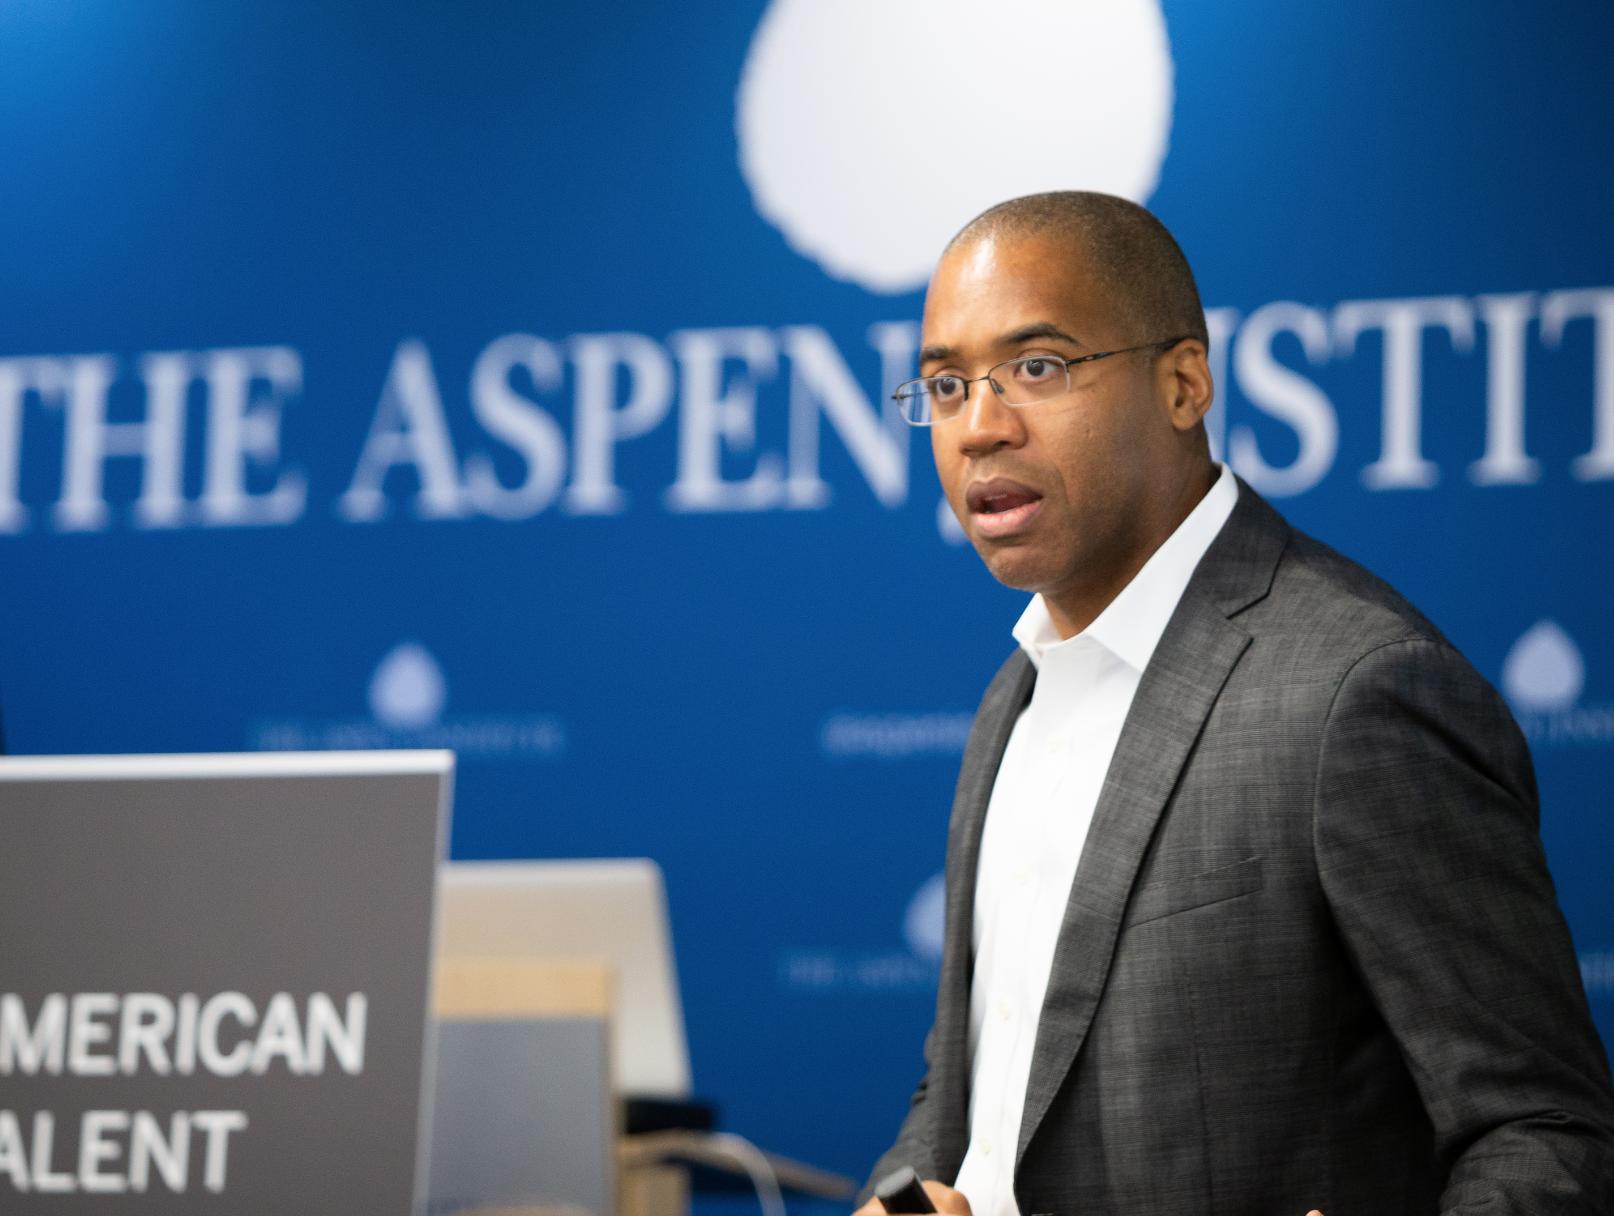 photo of Dawan Stanford facilitating at the Aspen Institute in DC